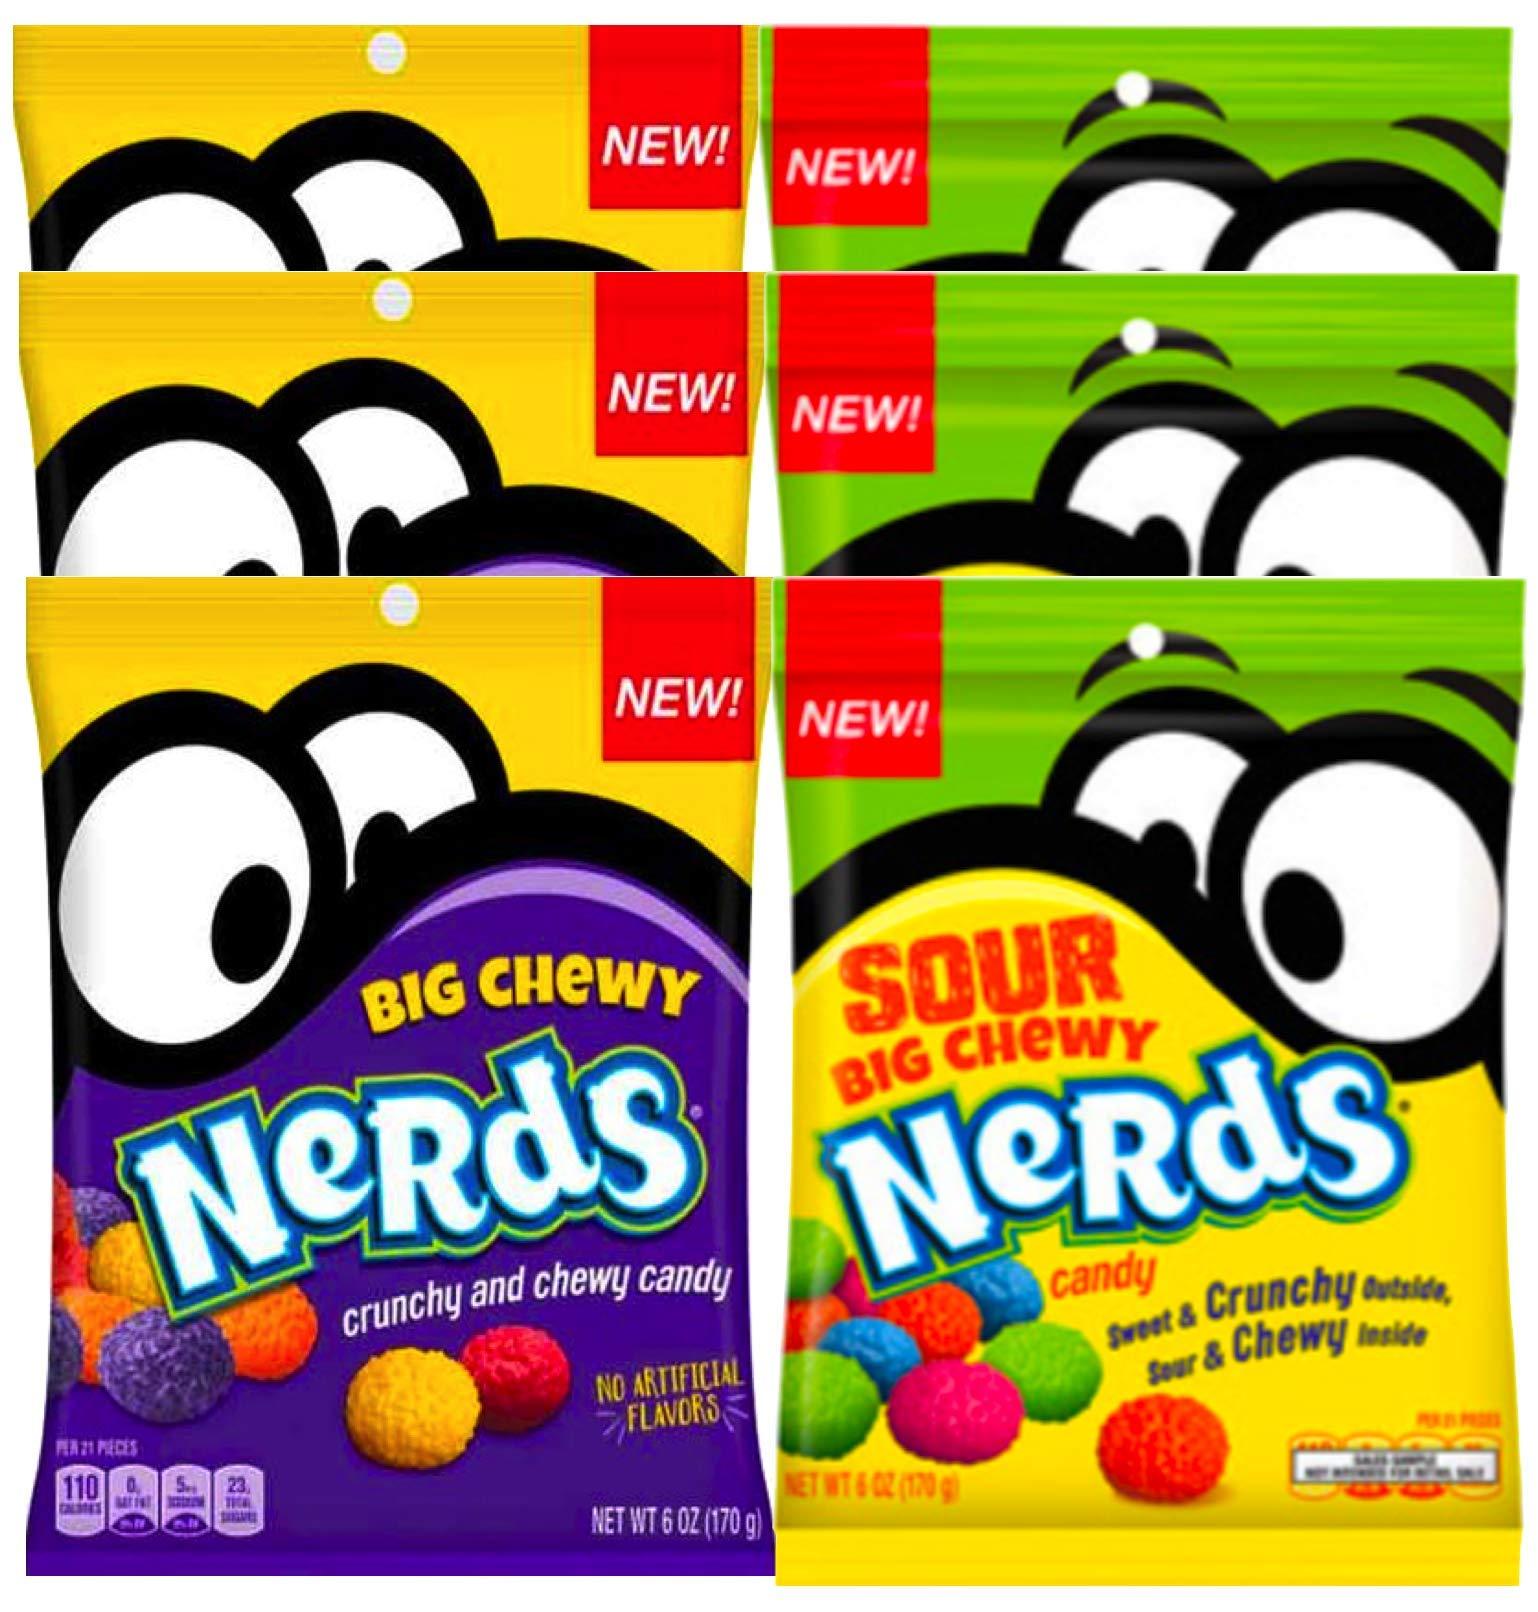 NEW Nerds Big Chewy Nerds Sour & Crunchy No Artificial Flavors Net WT 6oz (6)